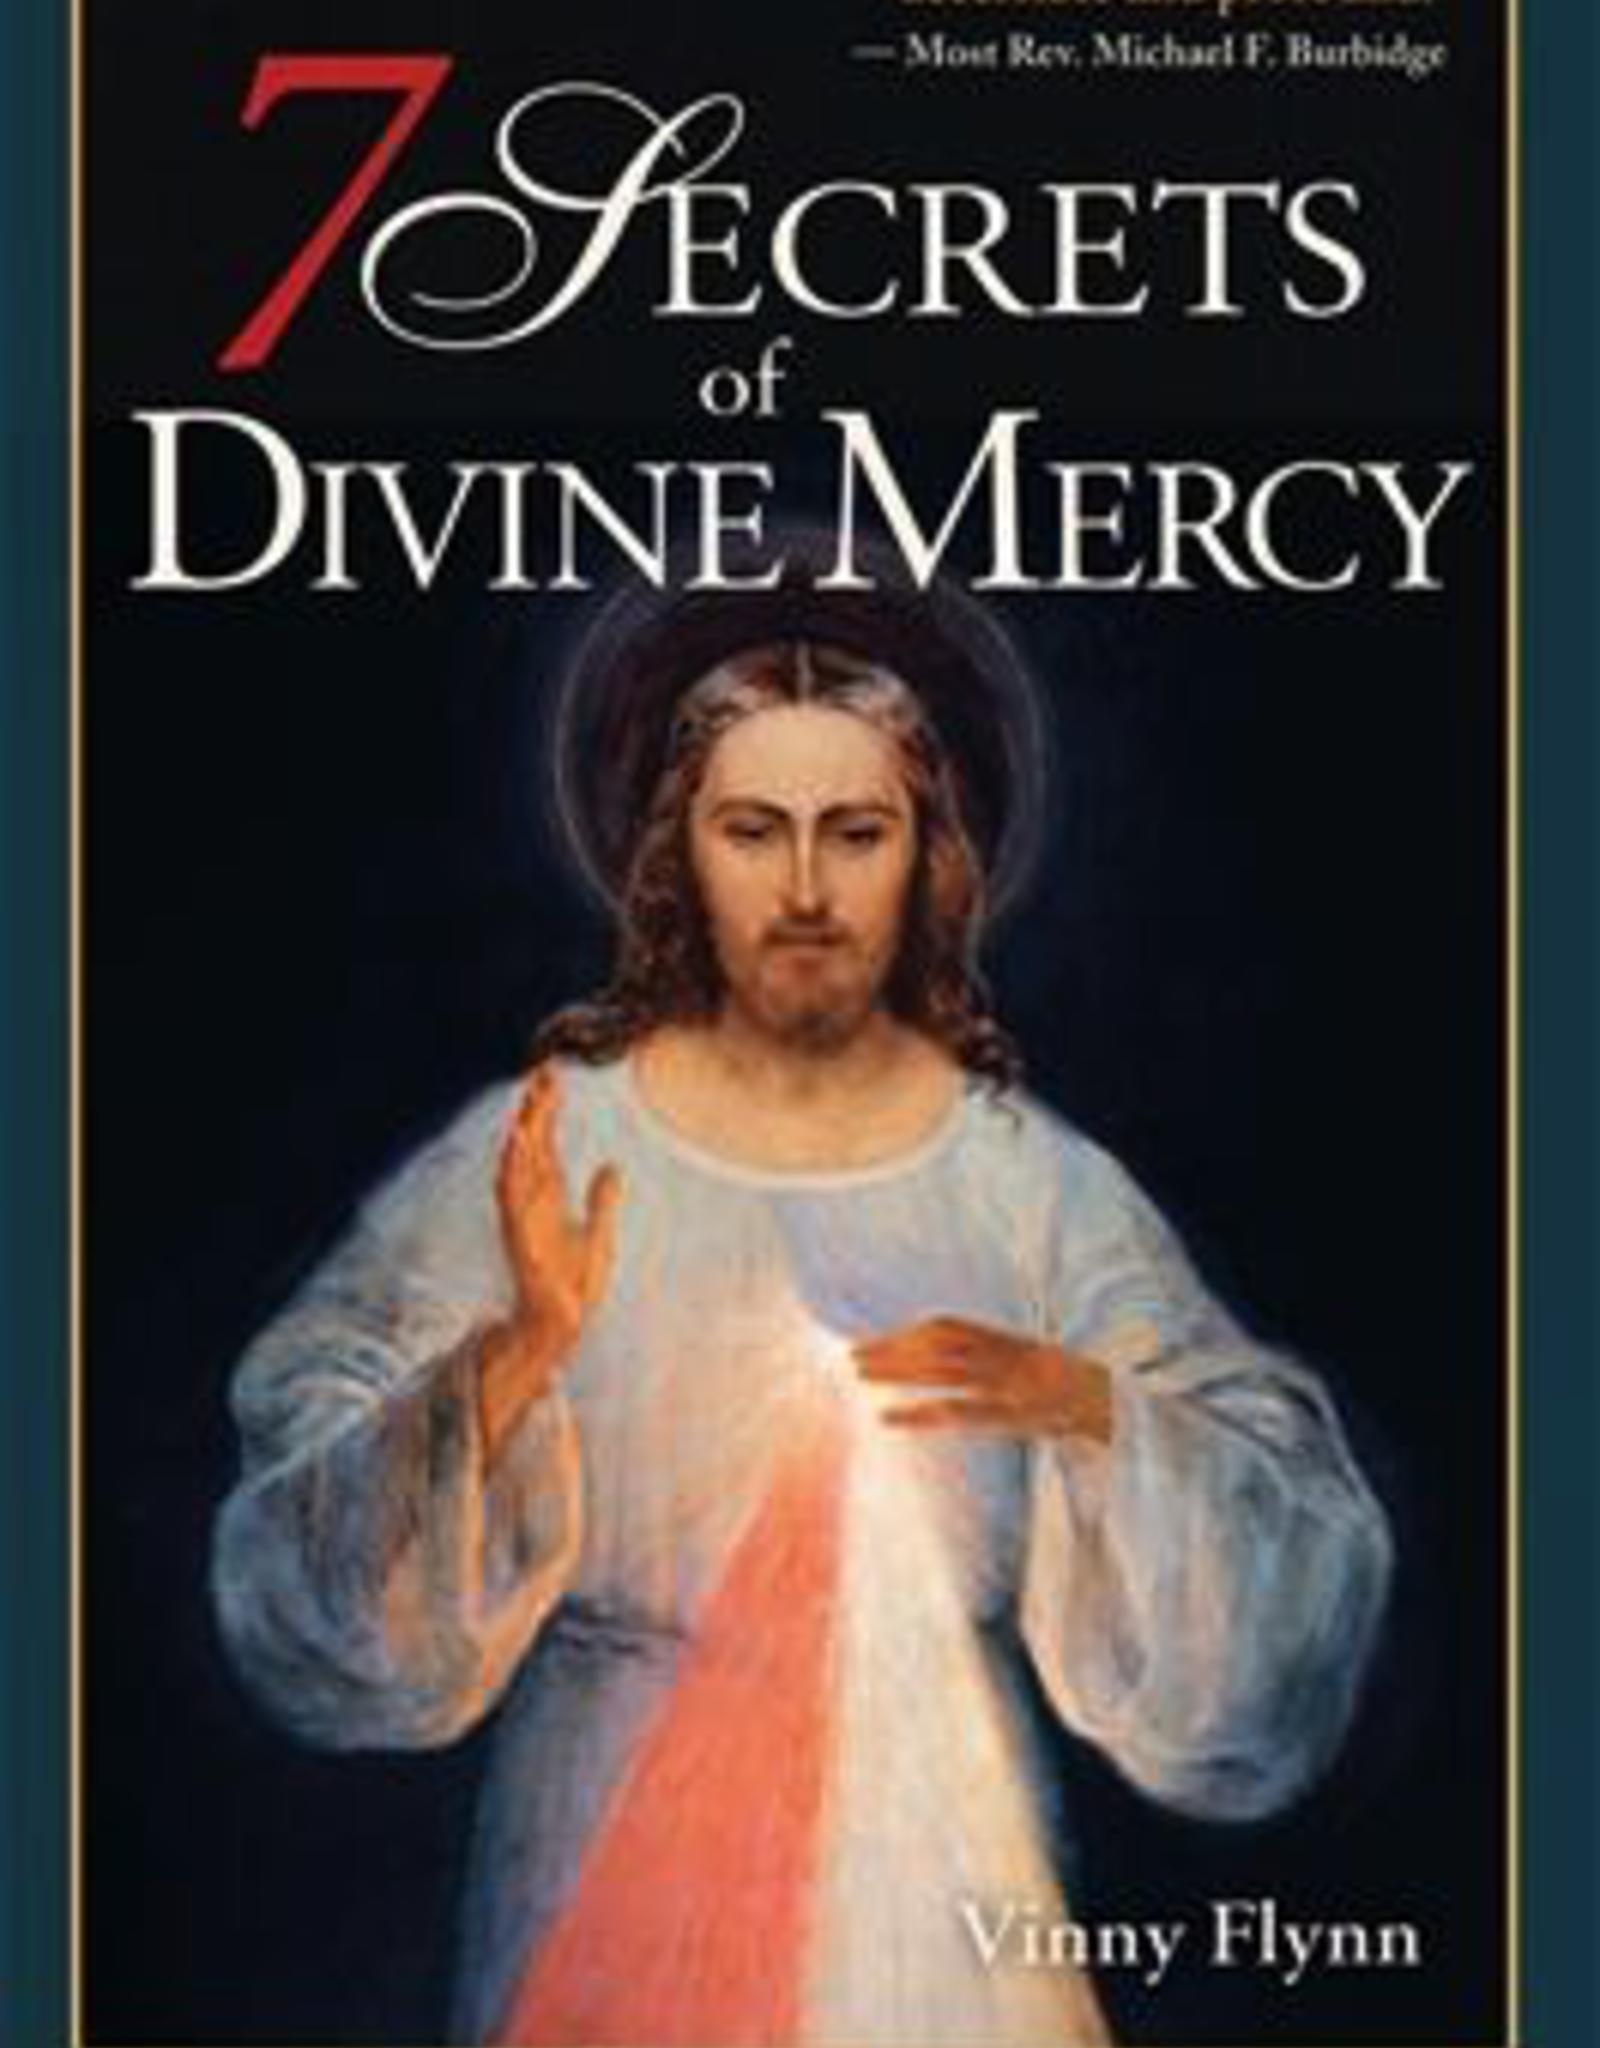 Ignatius Press 7 Secrets of Divine Mercy, by Vinny Flynn (paperback)